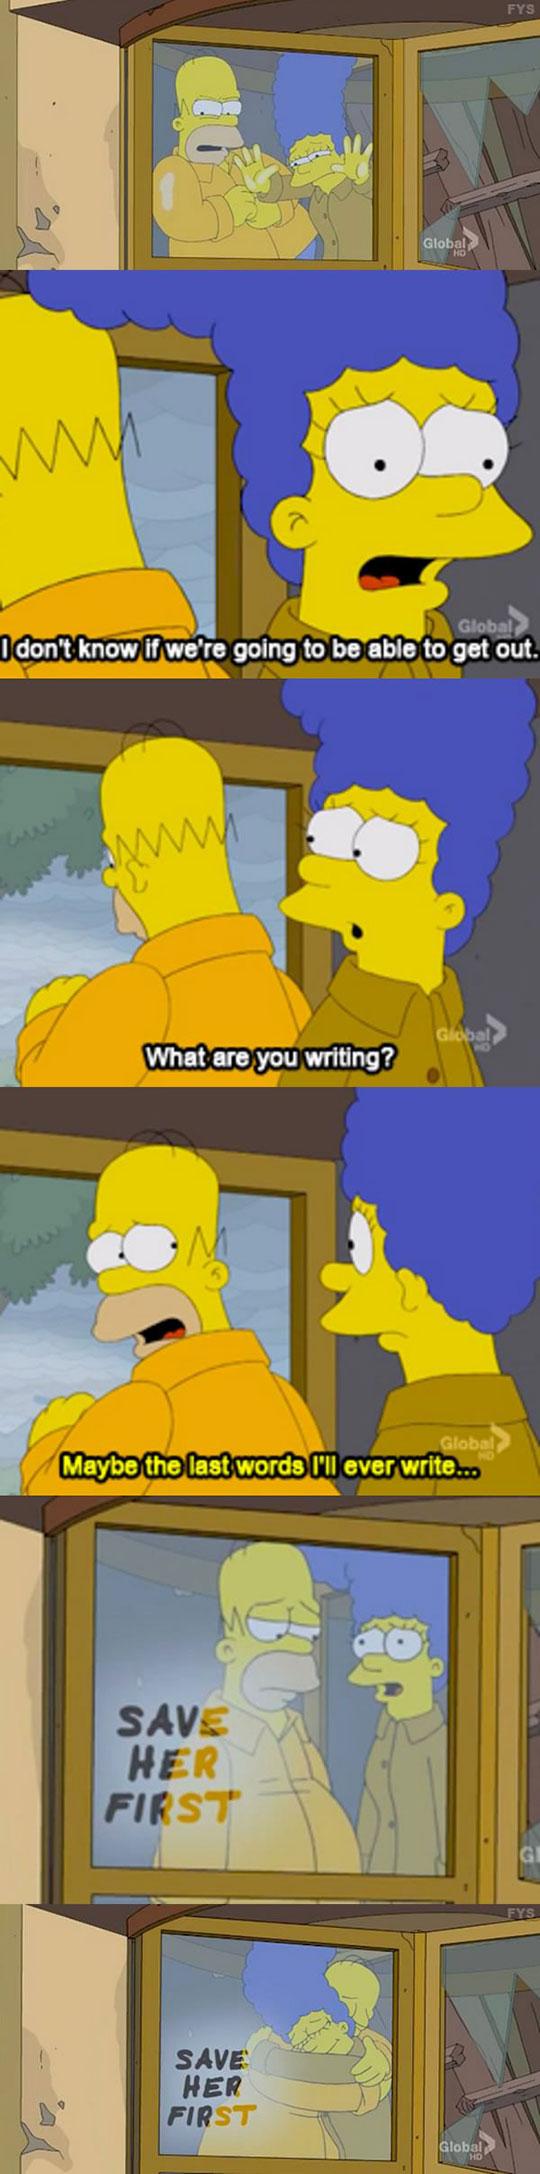 Last Words I'll Ever Write